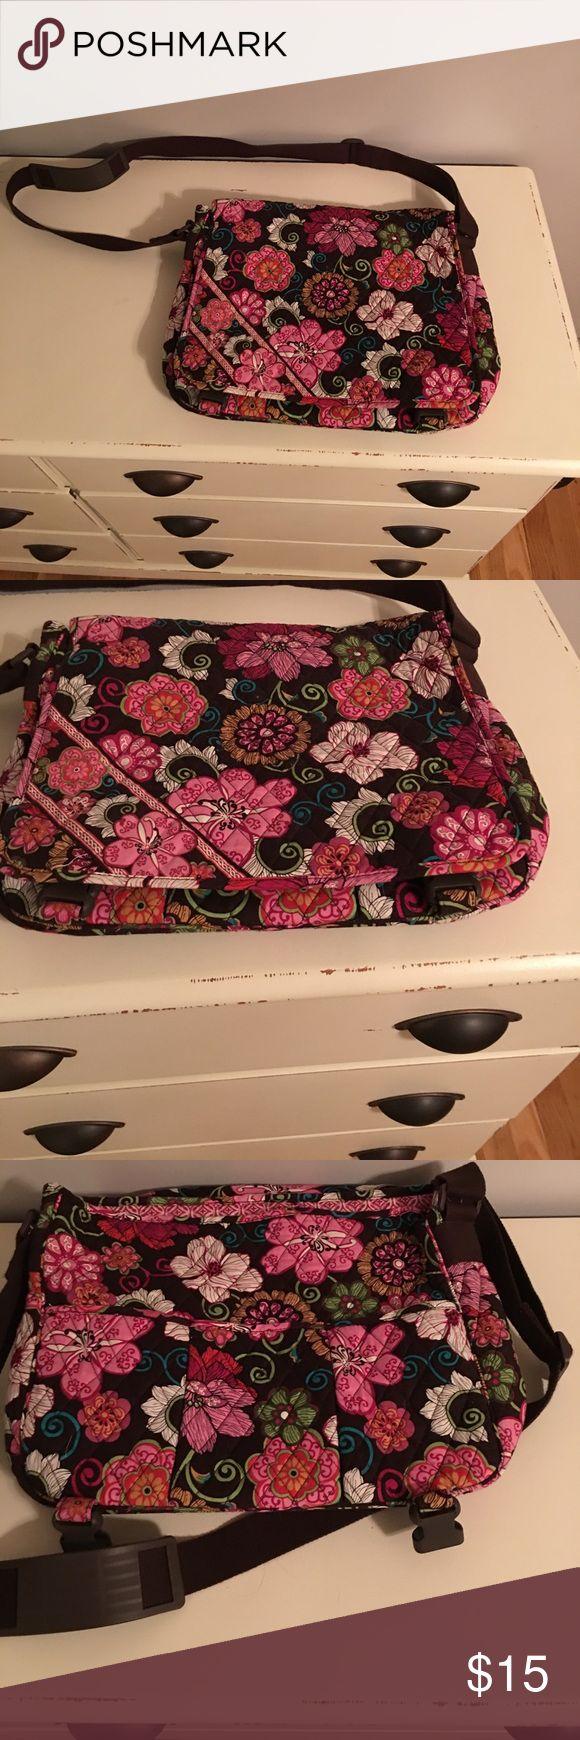 Vera Bradley messenger bag Cute messenger bag in good condition Vera Bradley Bags Satchels